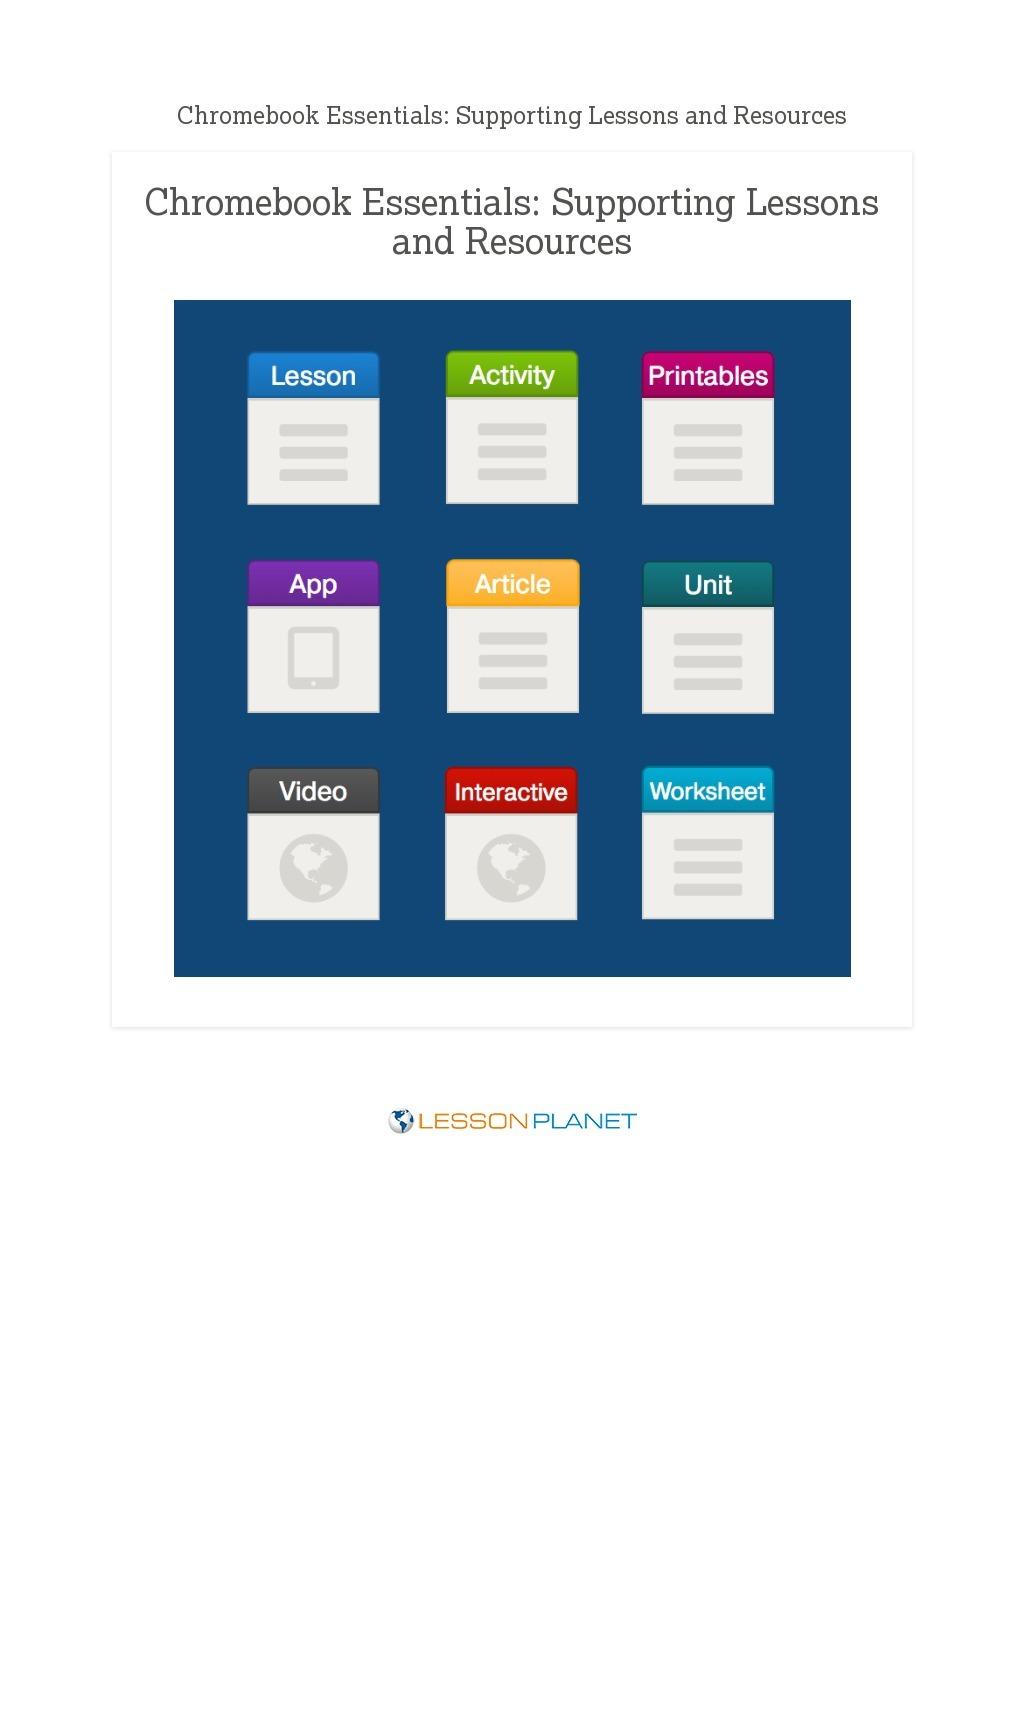 Google Docs Lesson Plans \u0026 Worksheets Reviewed by Teachers [ 1736 x 1024 Pixel ]